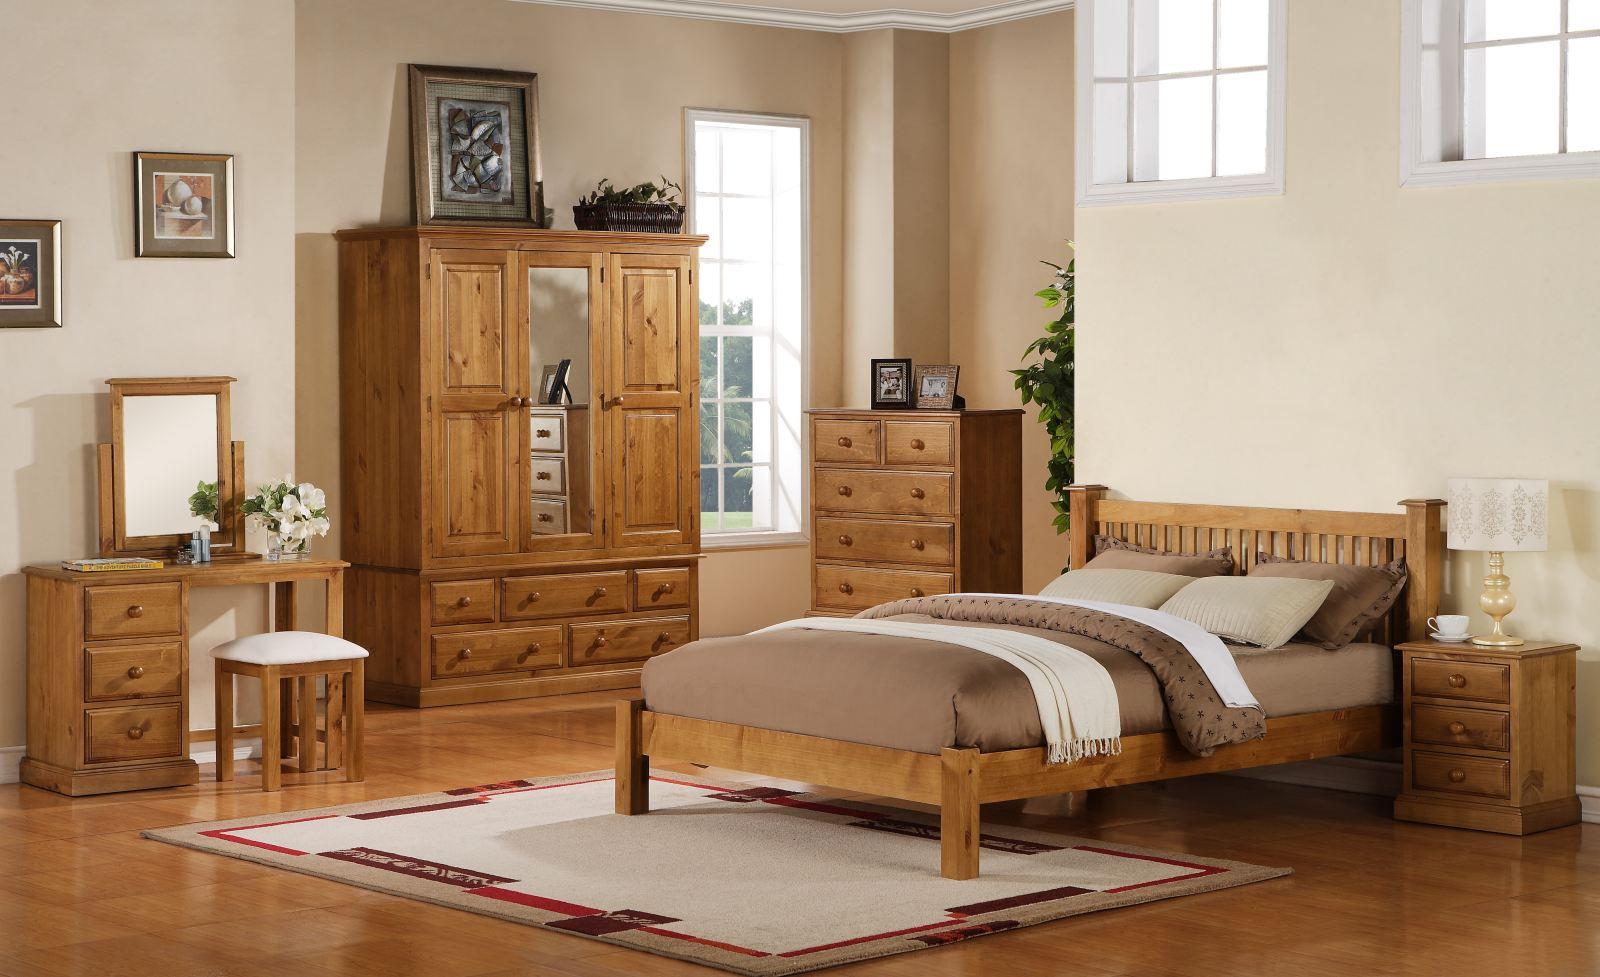 Pine Bedroom Furniture Shopping Tips